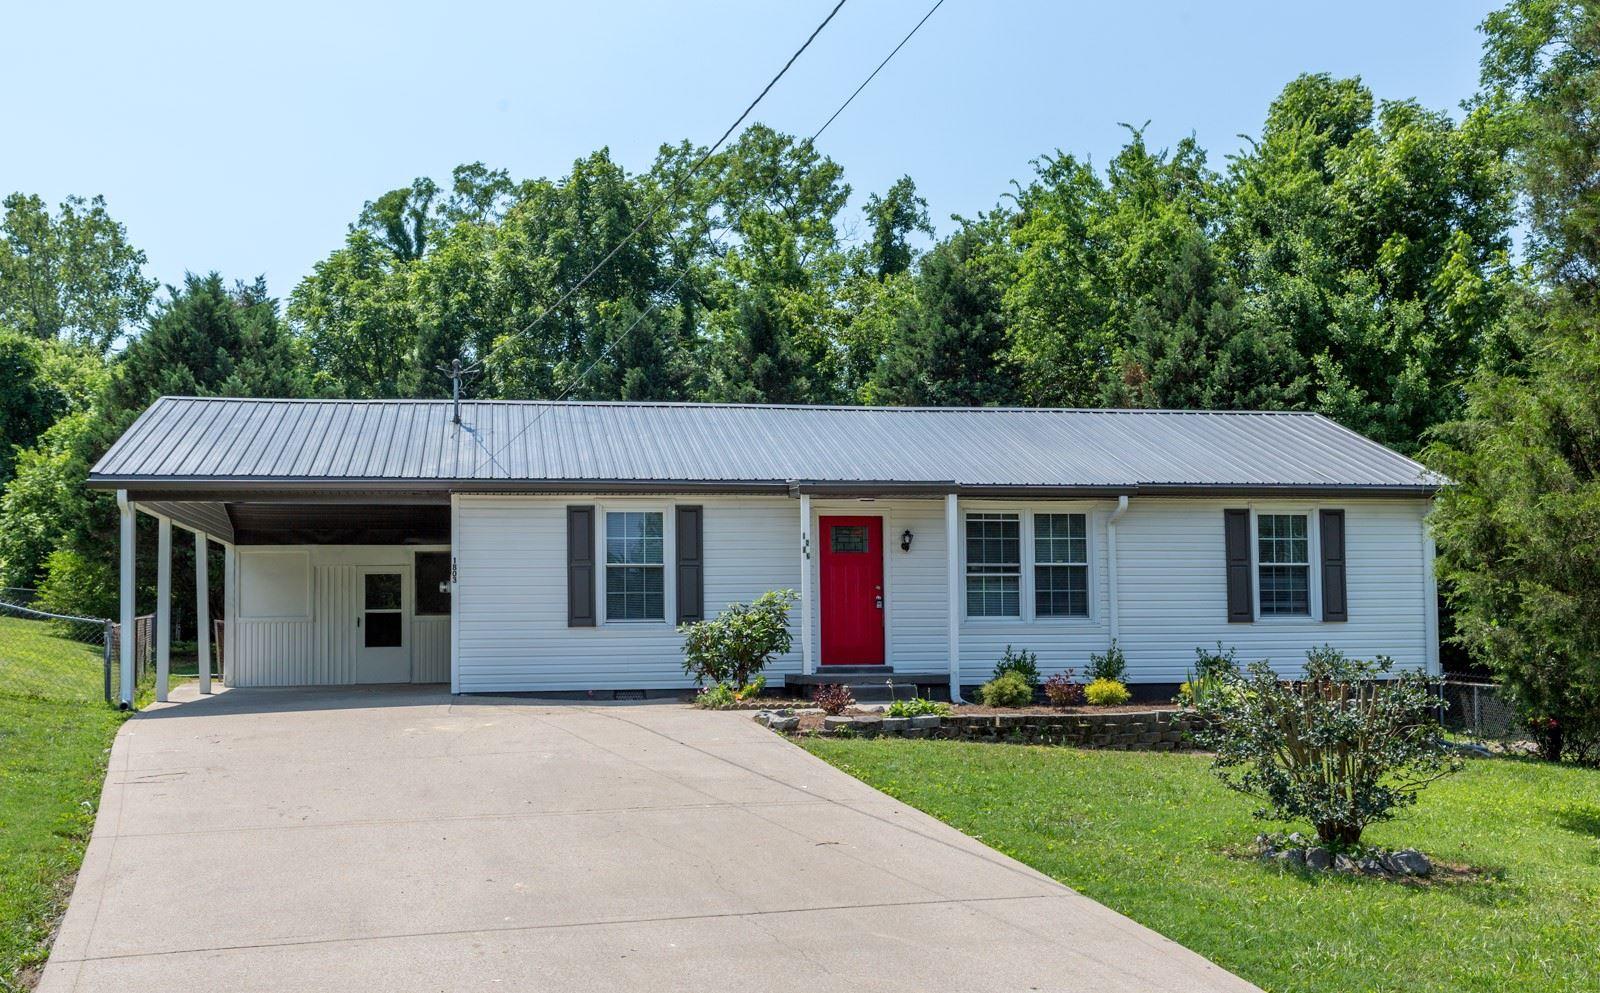 1803 Pinto Ct, Clarksville, TN 37042 - MLS#: 2264363